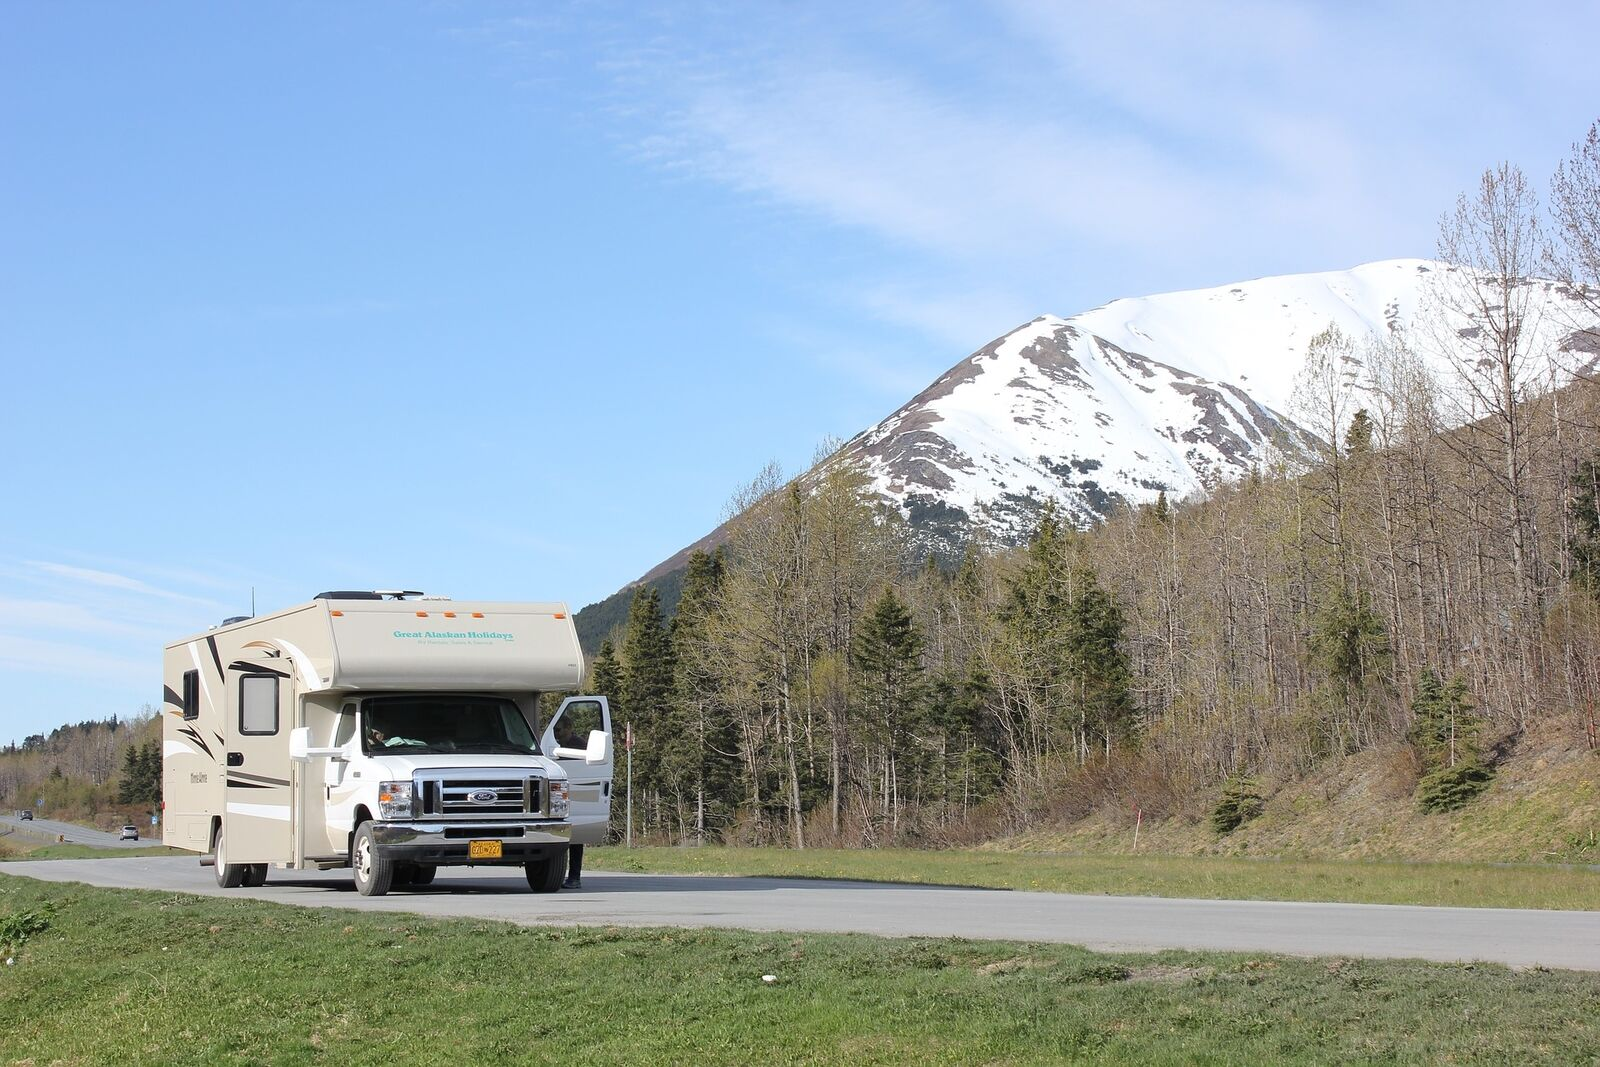 Windy west Caravan and RV